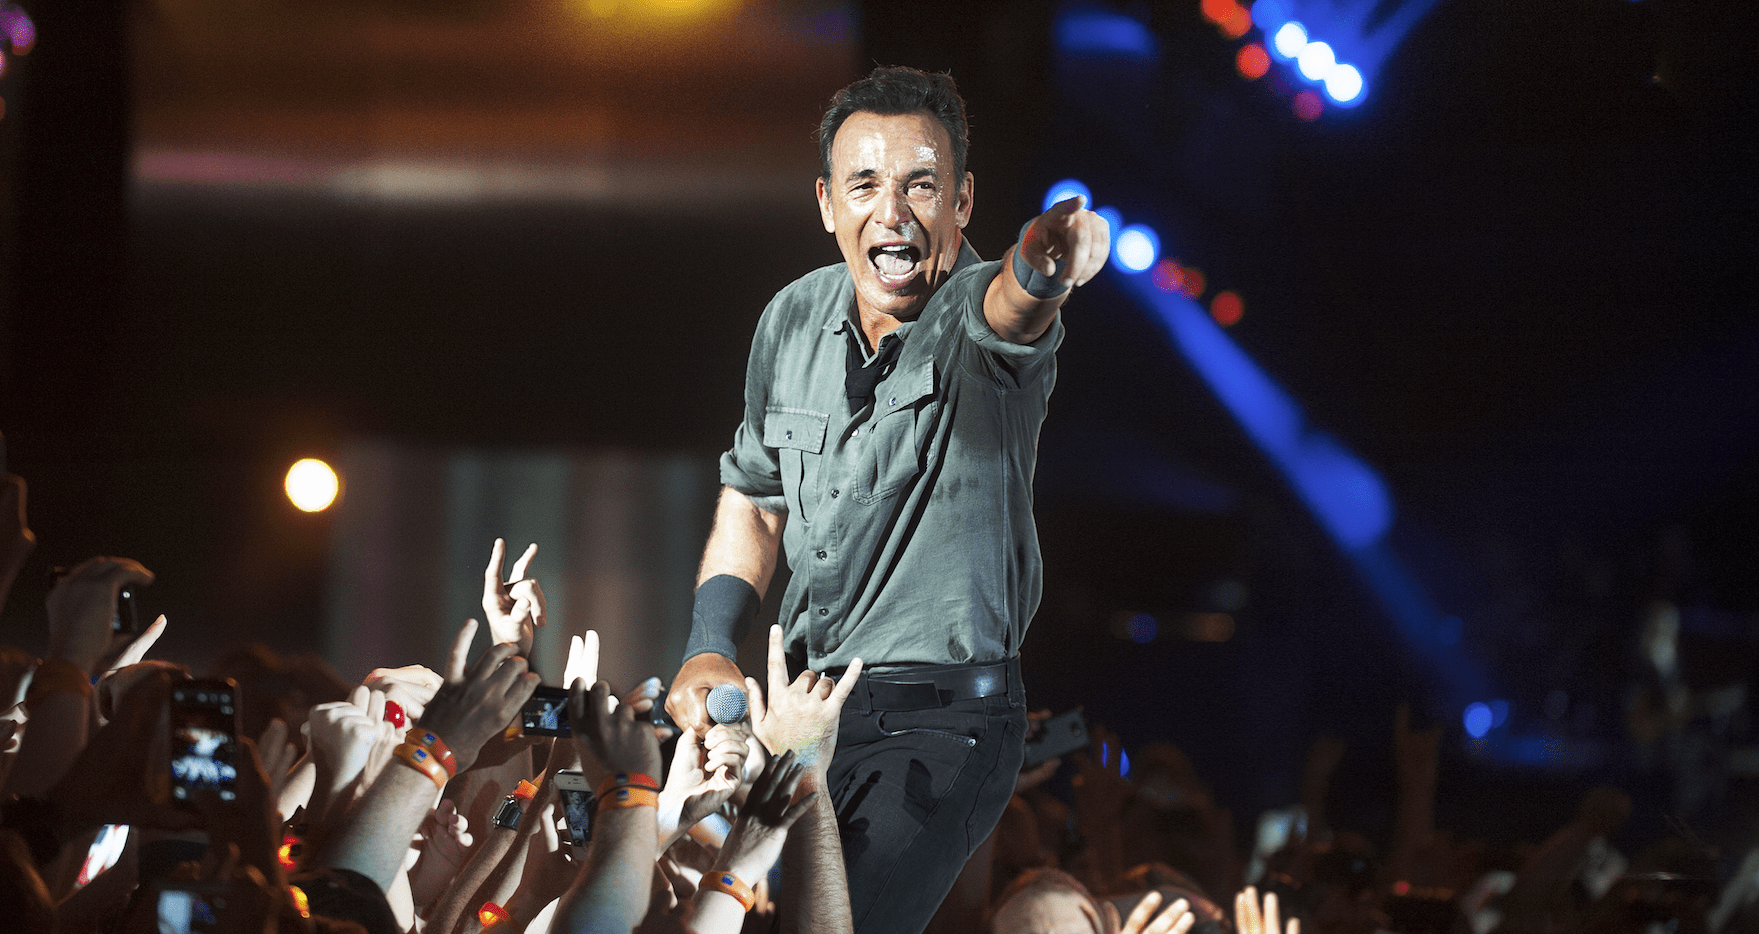 Bruce Springsteen DDR 1988